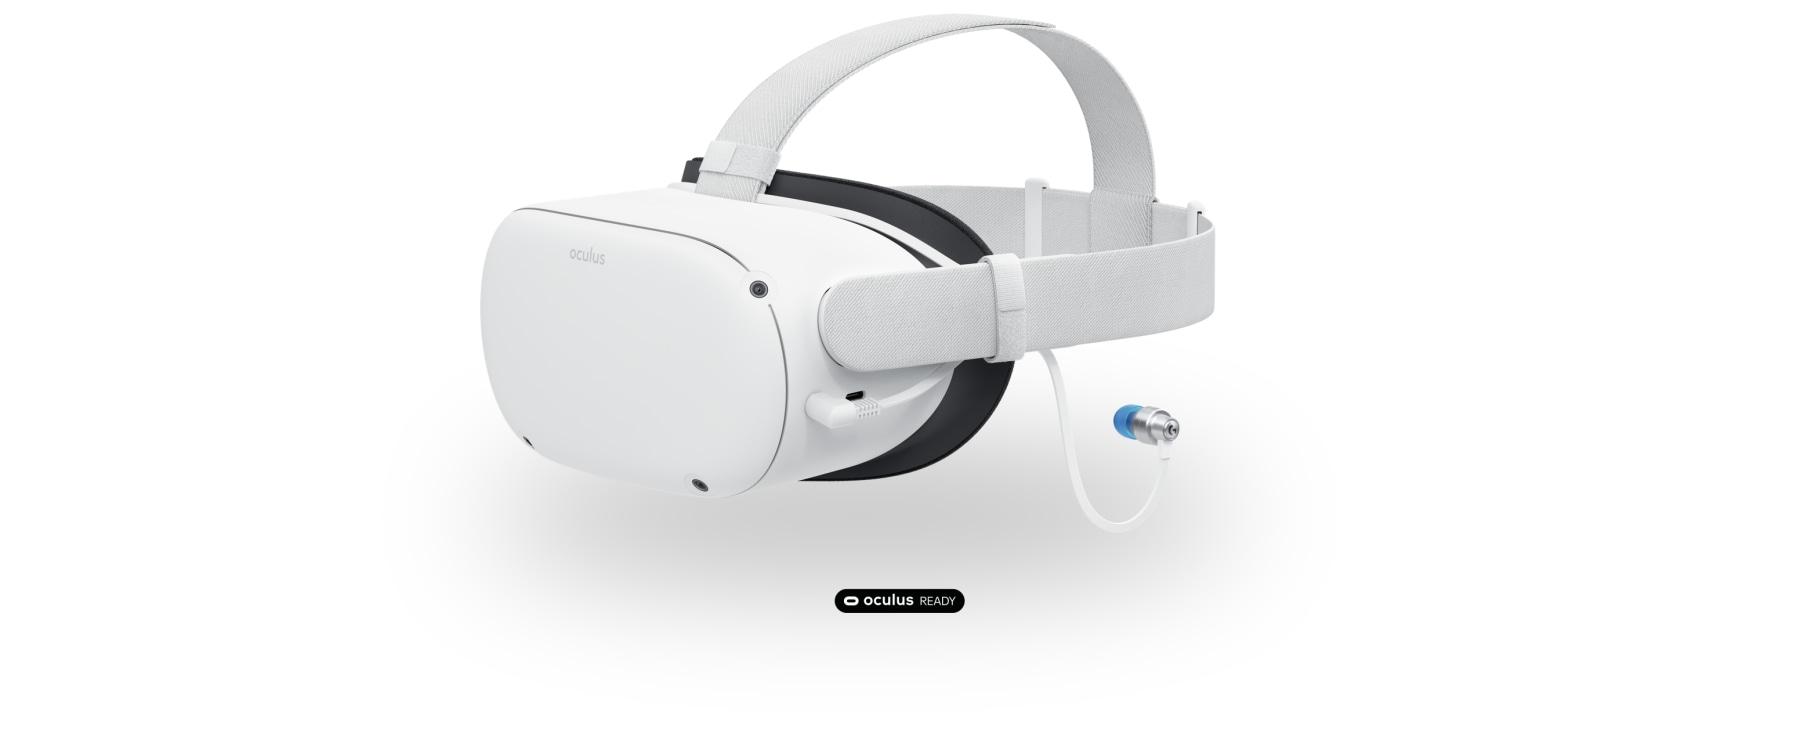 G333 VR OCULUS READY™